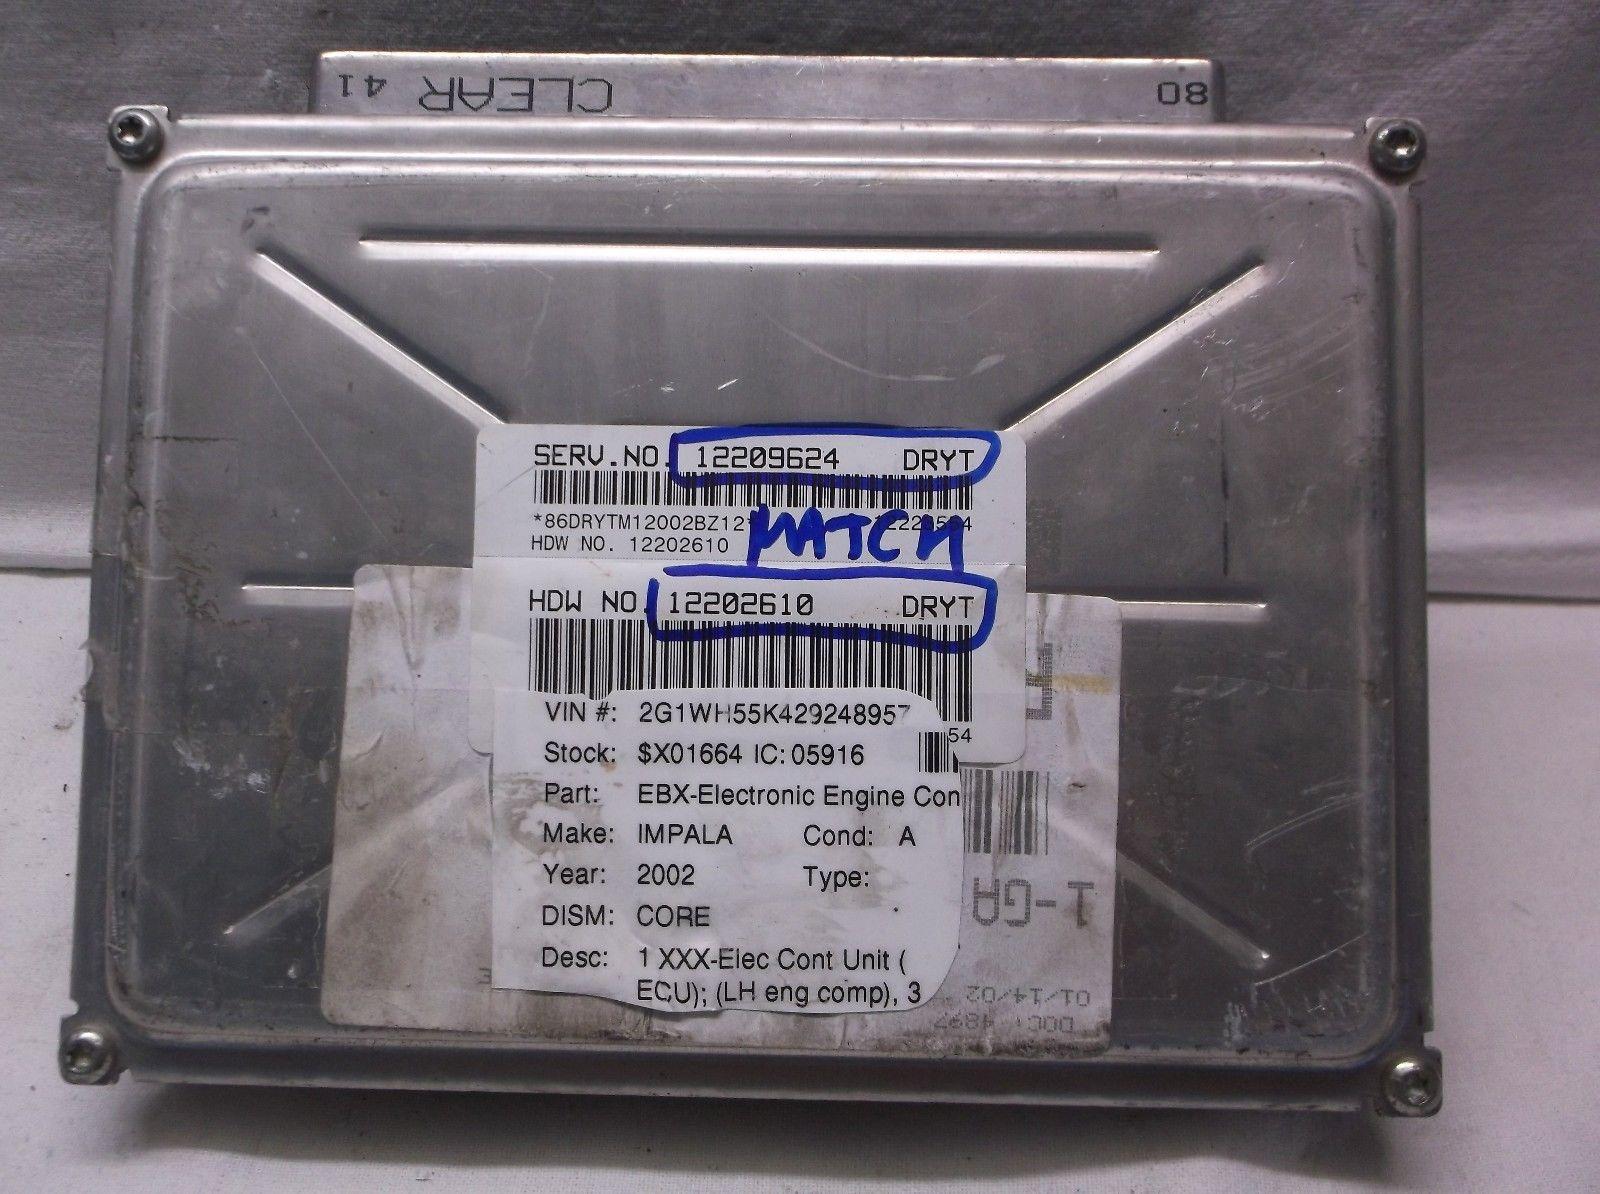 02 Chevrolet Impala Monte Carlo Engine Control Moduleecuecm